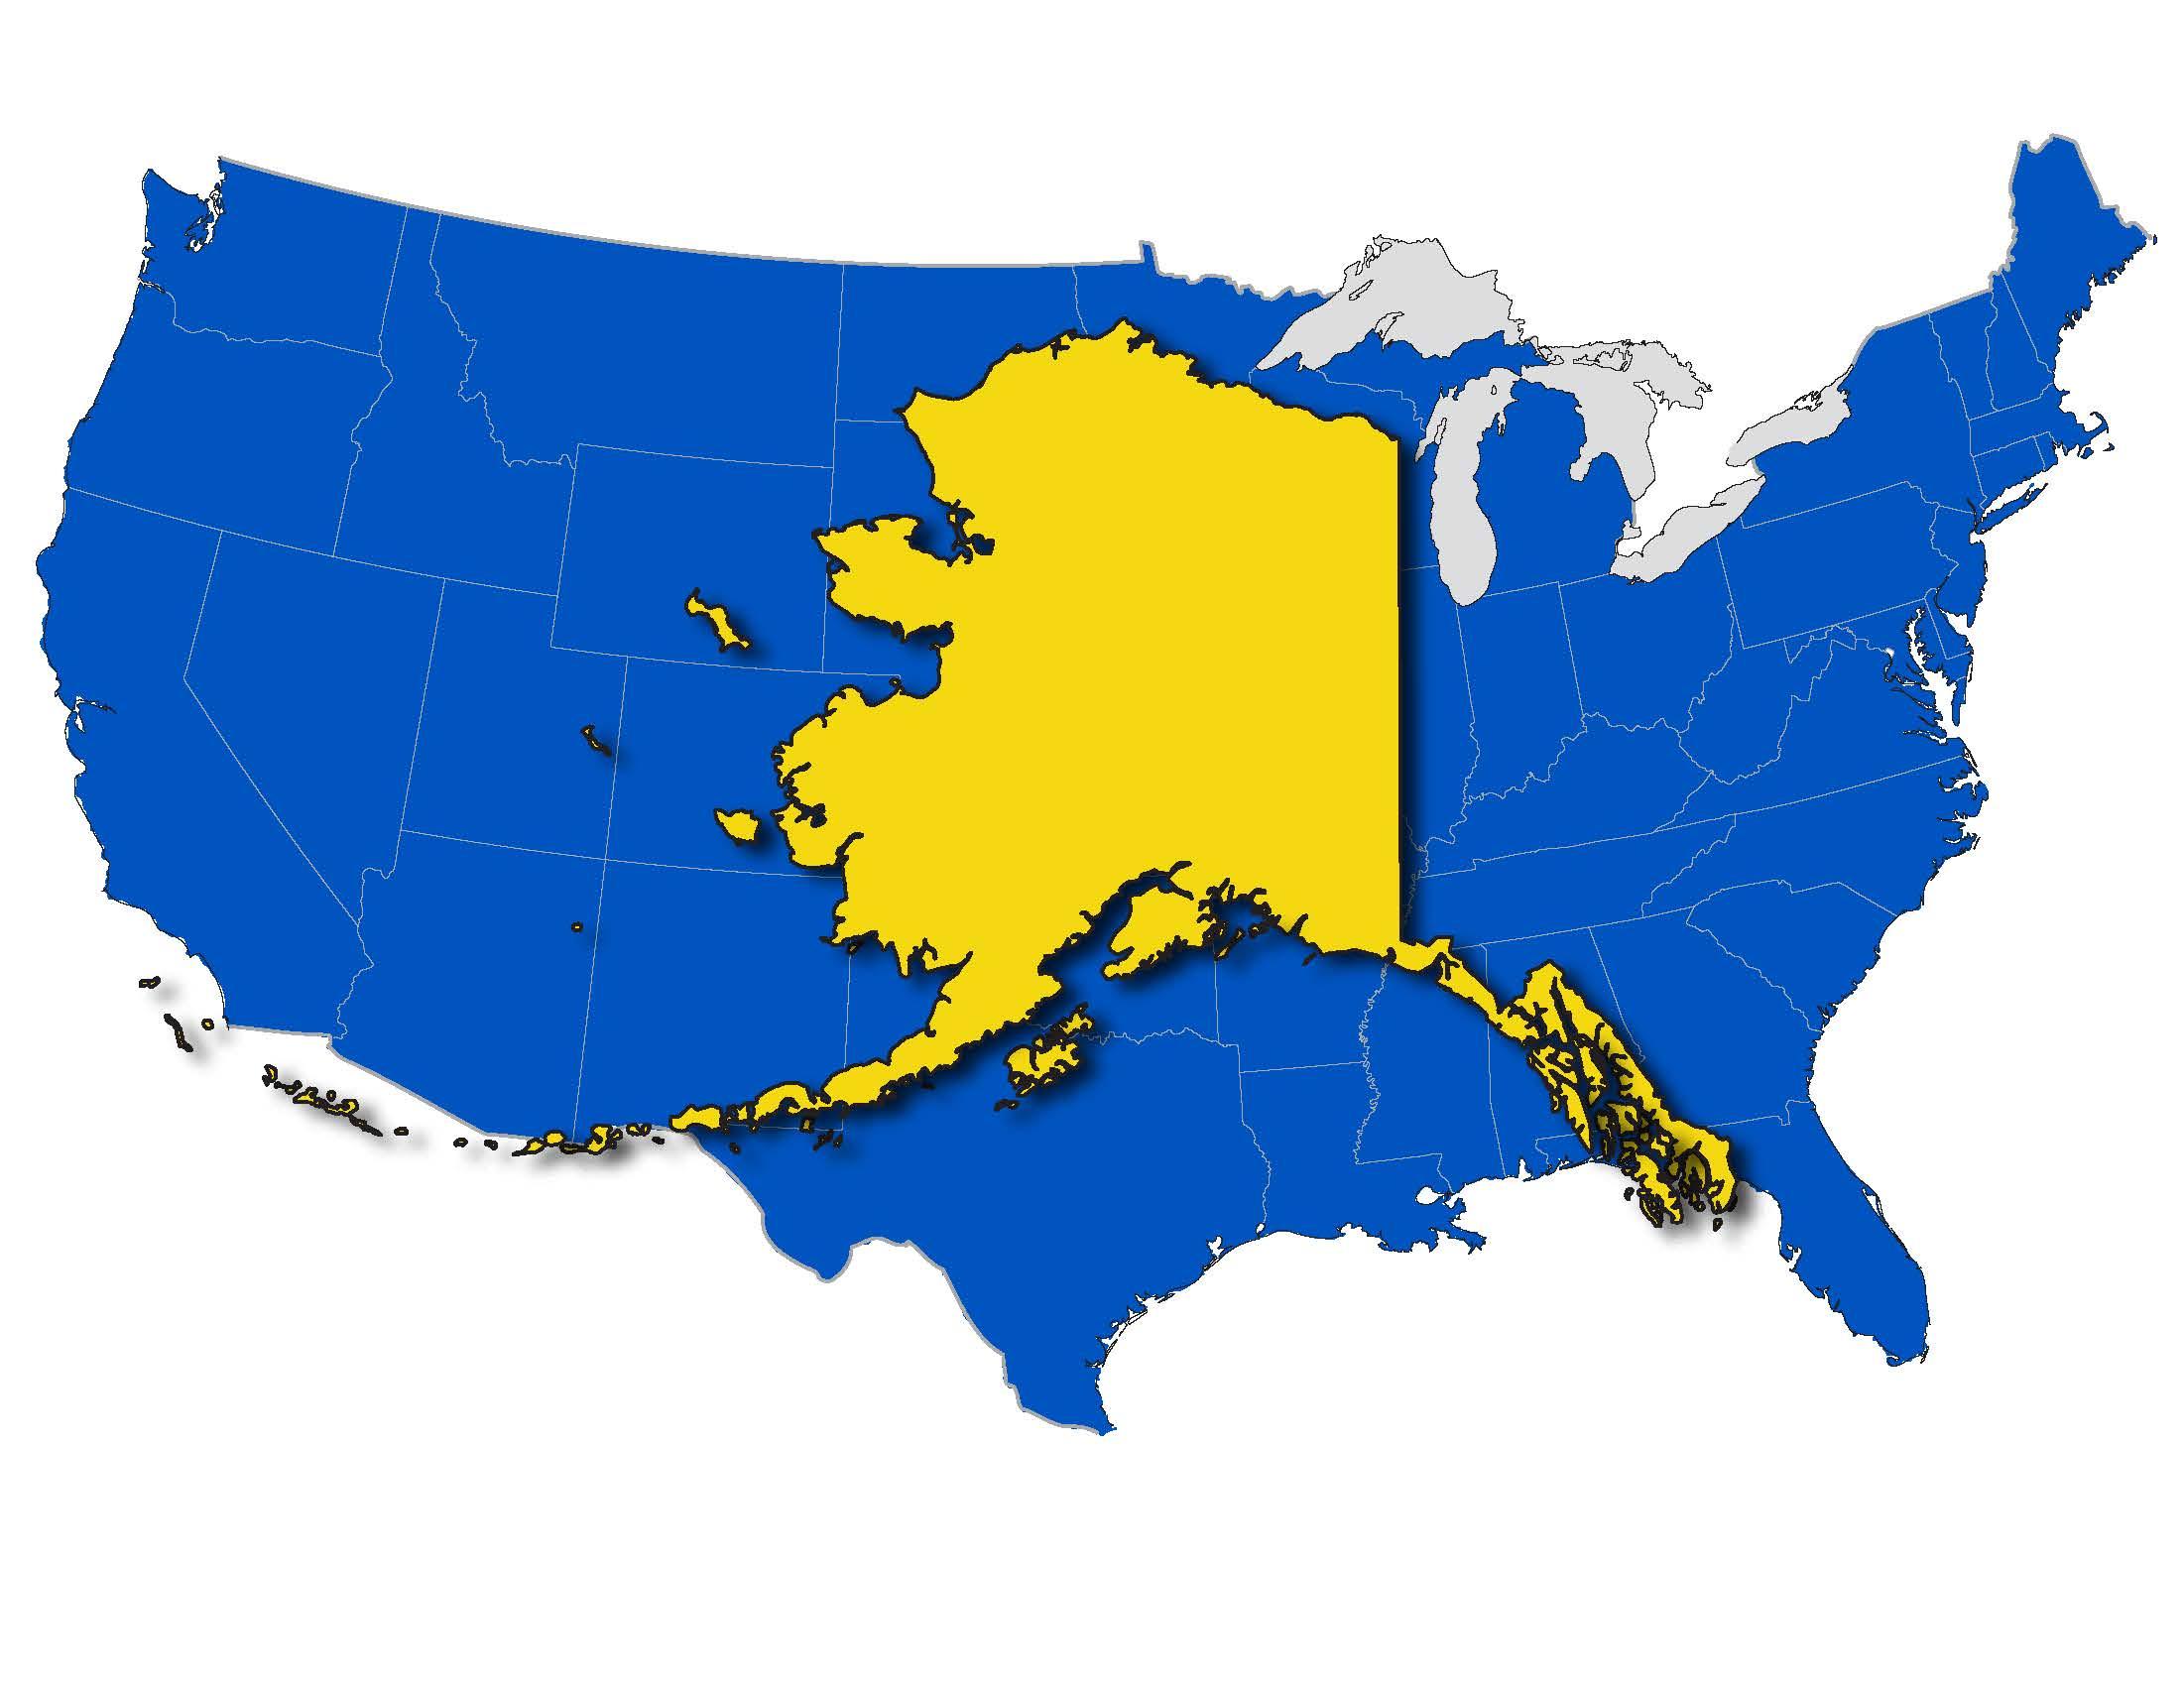 Alaska On Emaze - State of alaska map